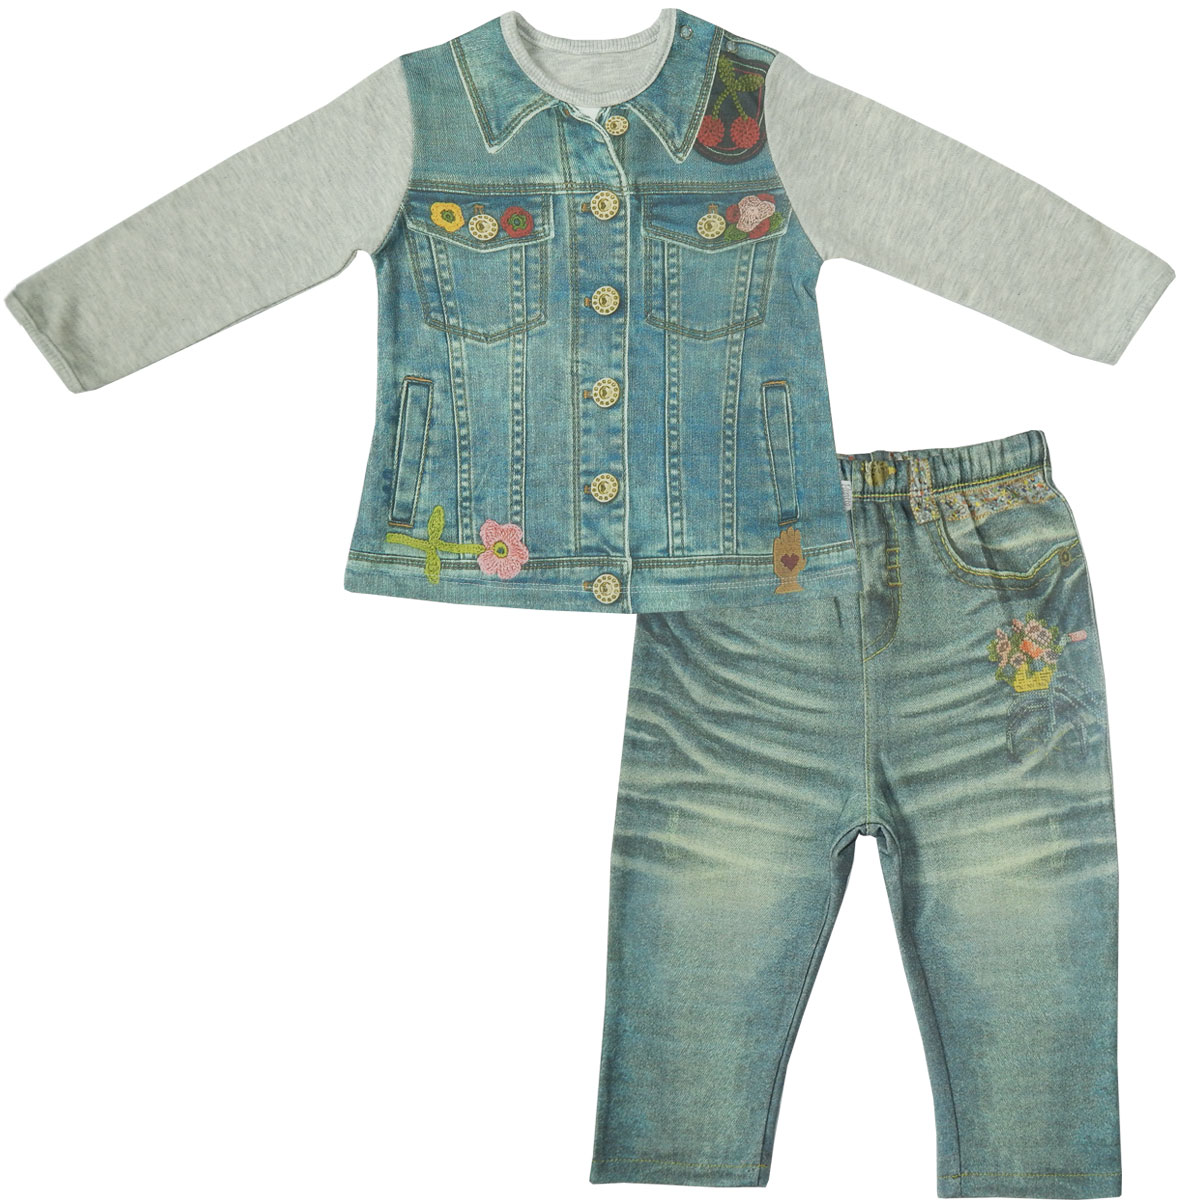 Комплект одежды Папитто для девочки Fashion Jeans 594-05 р.24-86